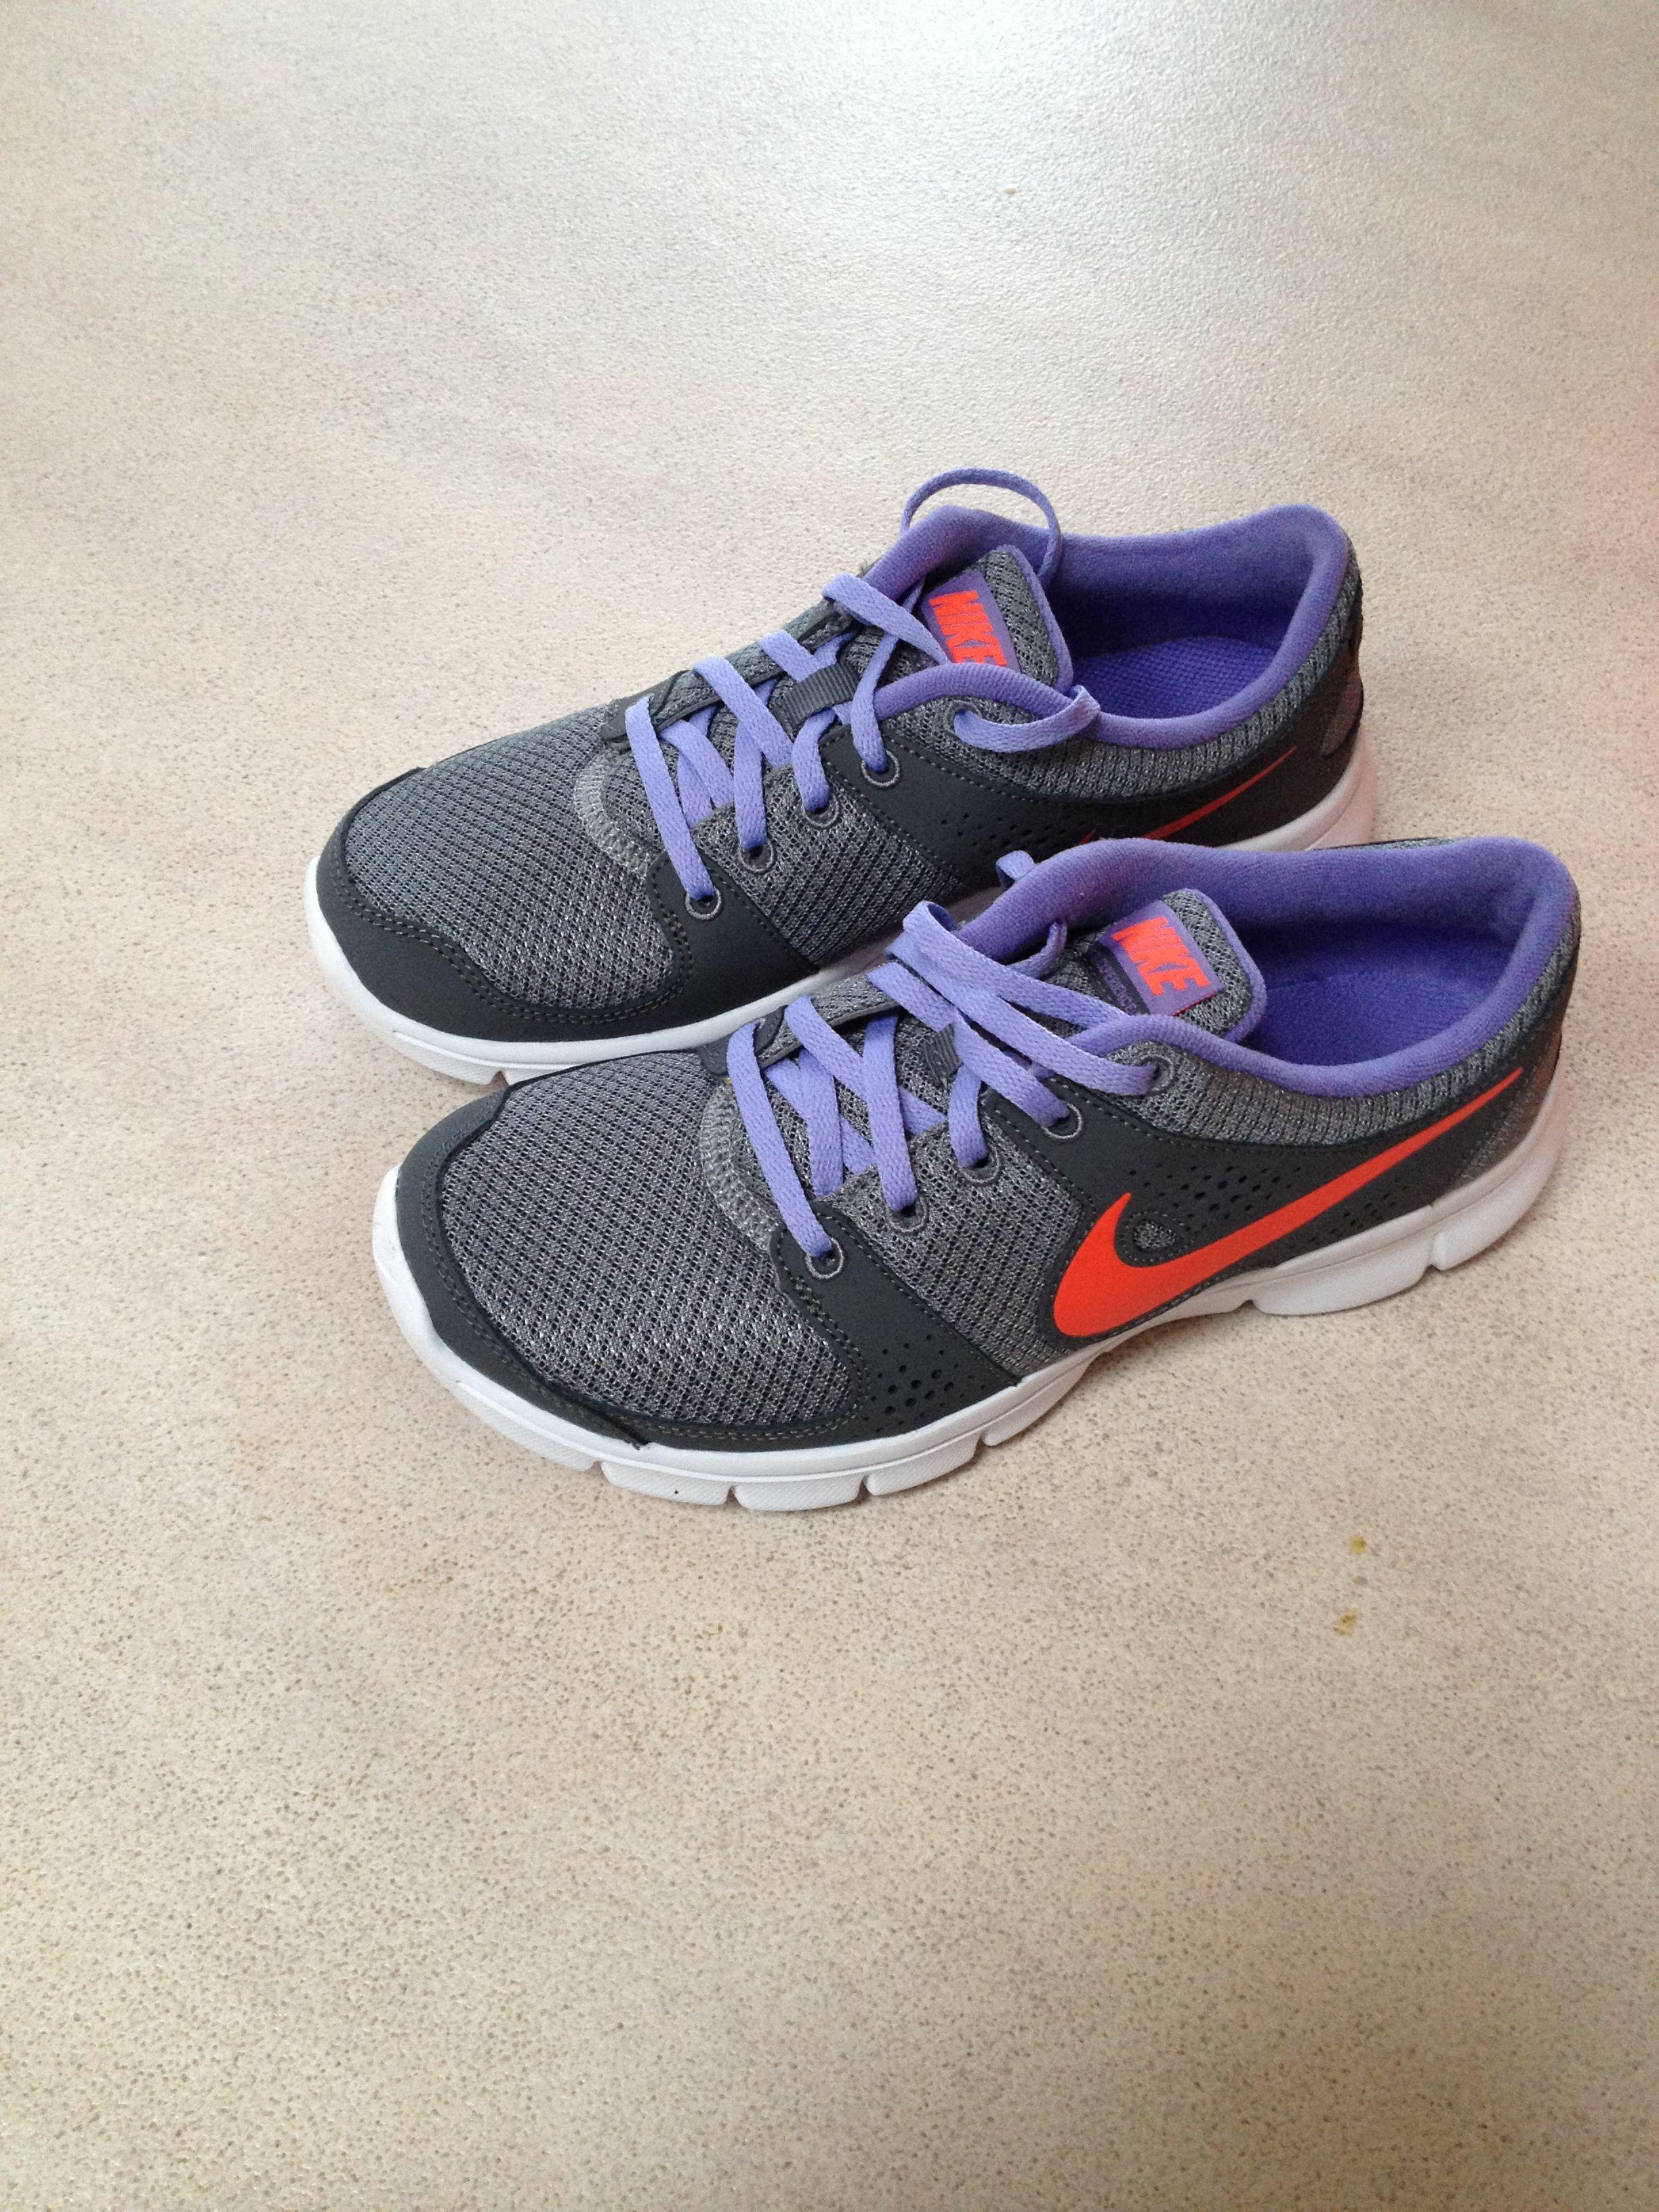 Nikes sneakers sneakers nike nike